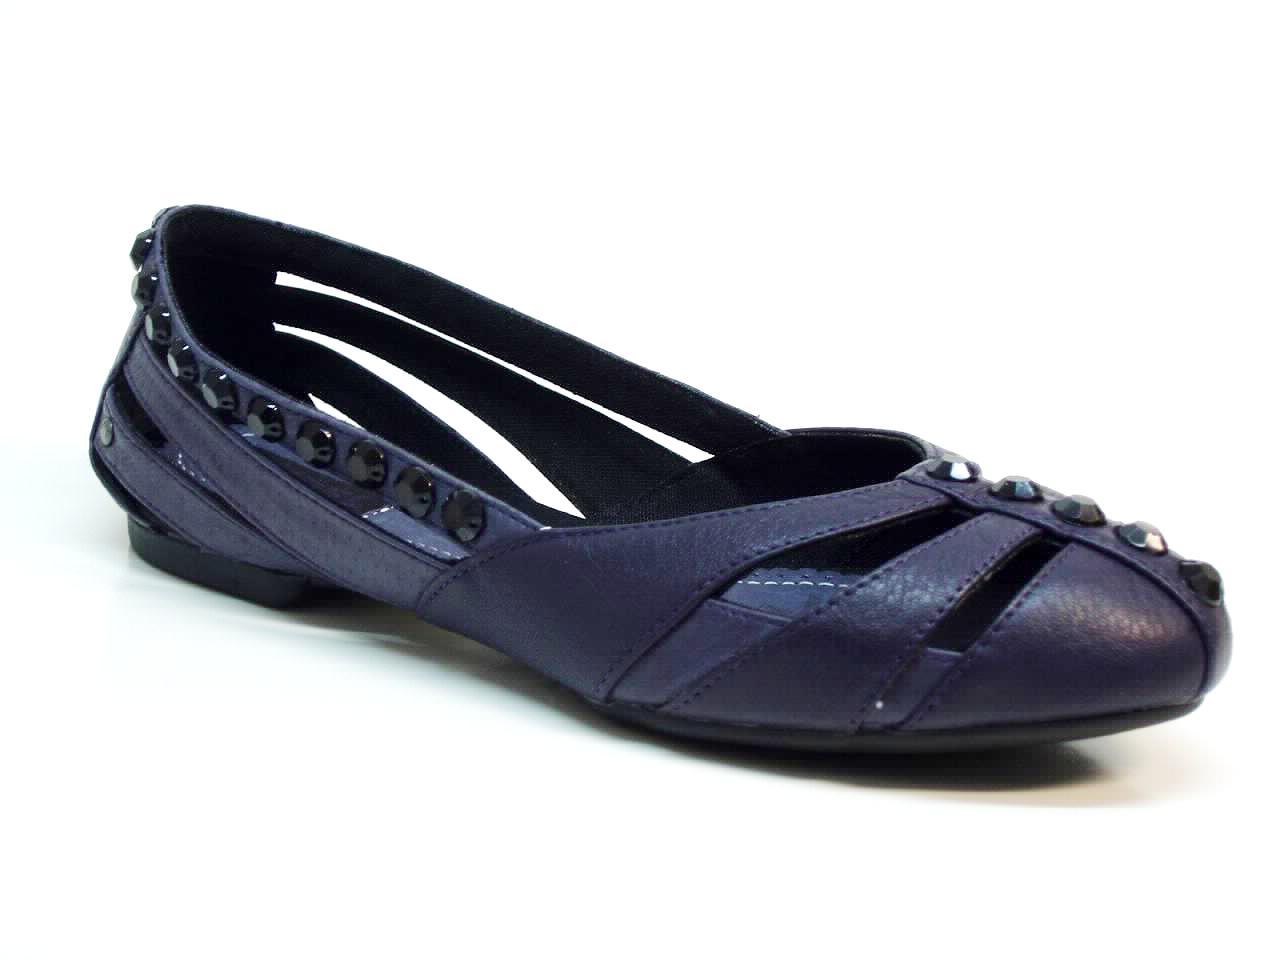 Sapatos Baixos, Sabrinas, Mocassins Diesel - 39000YA81